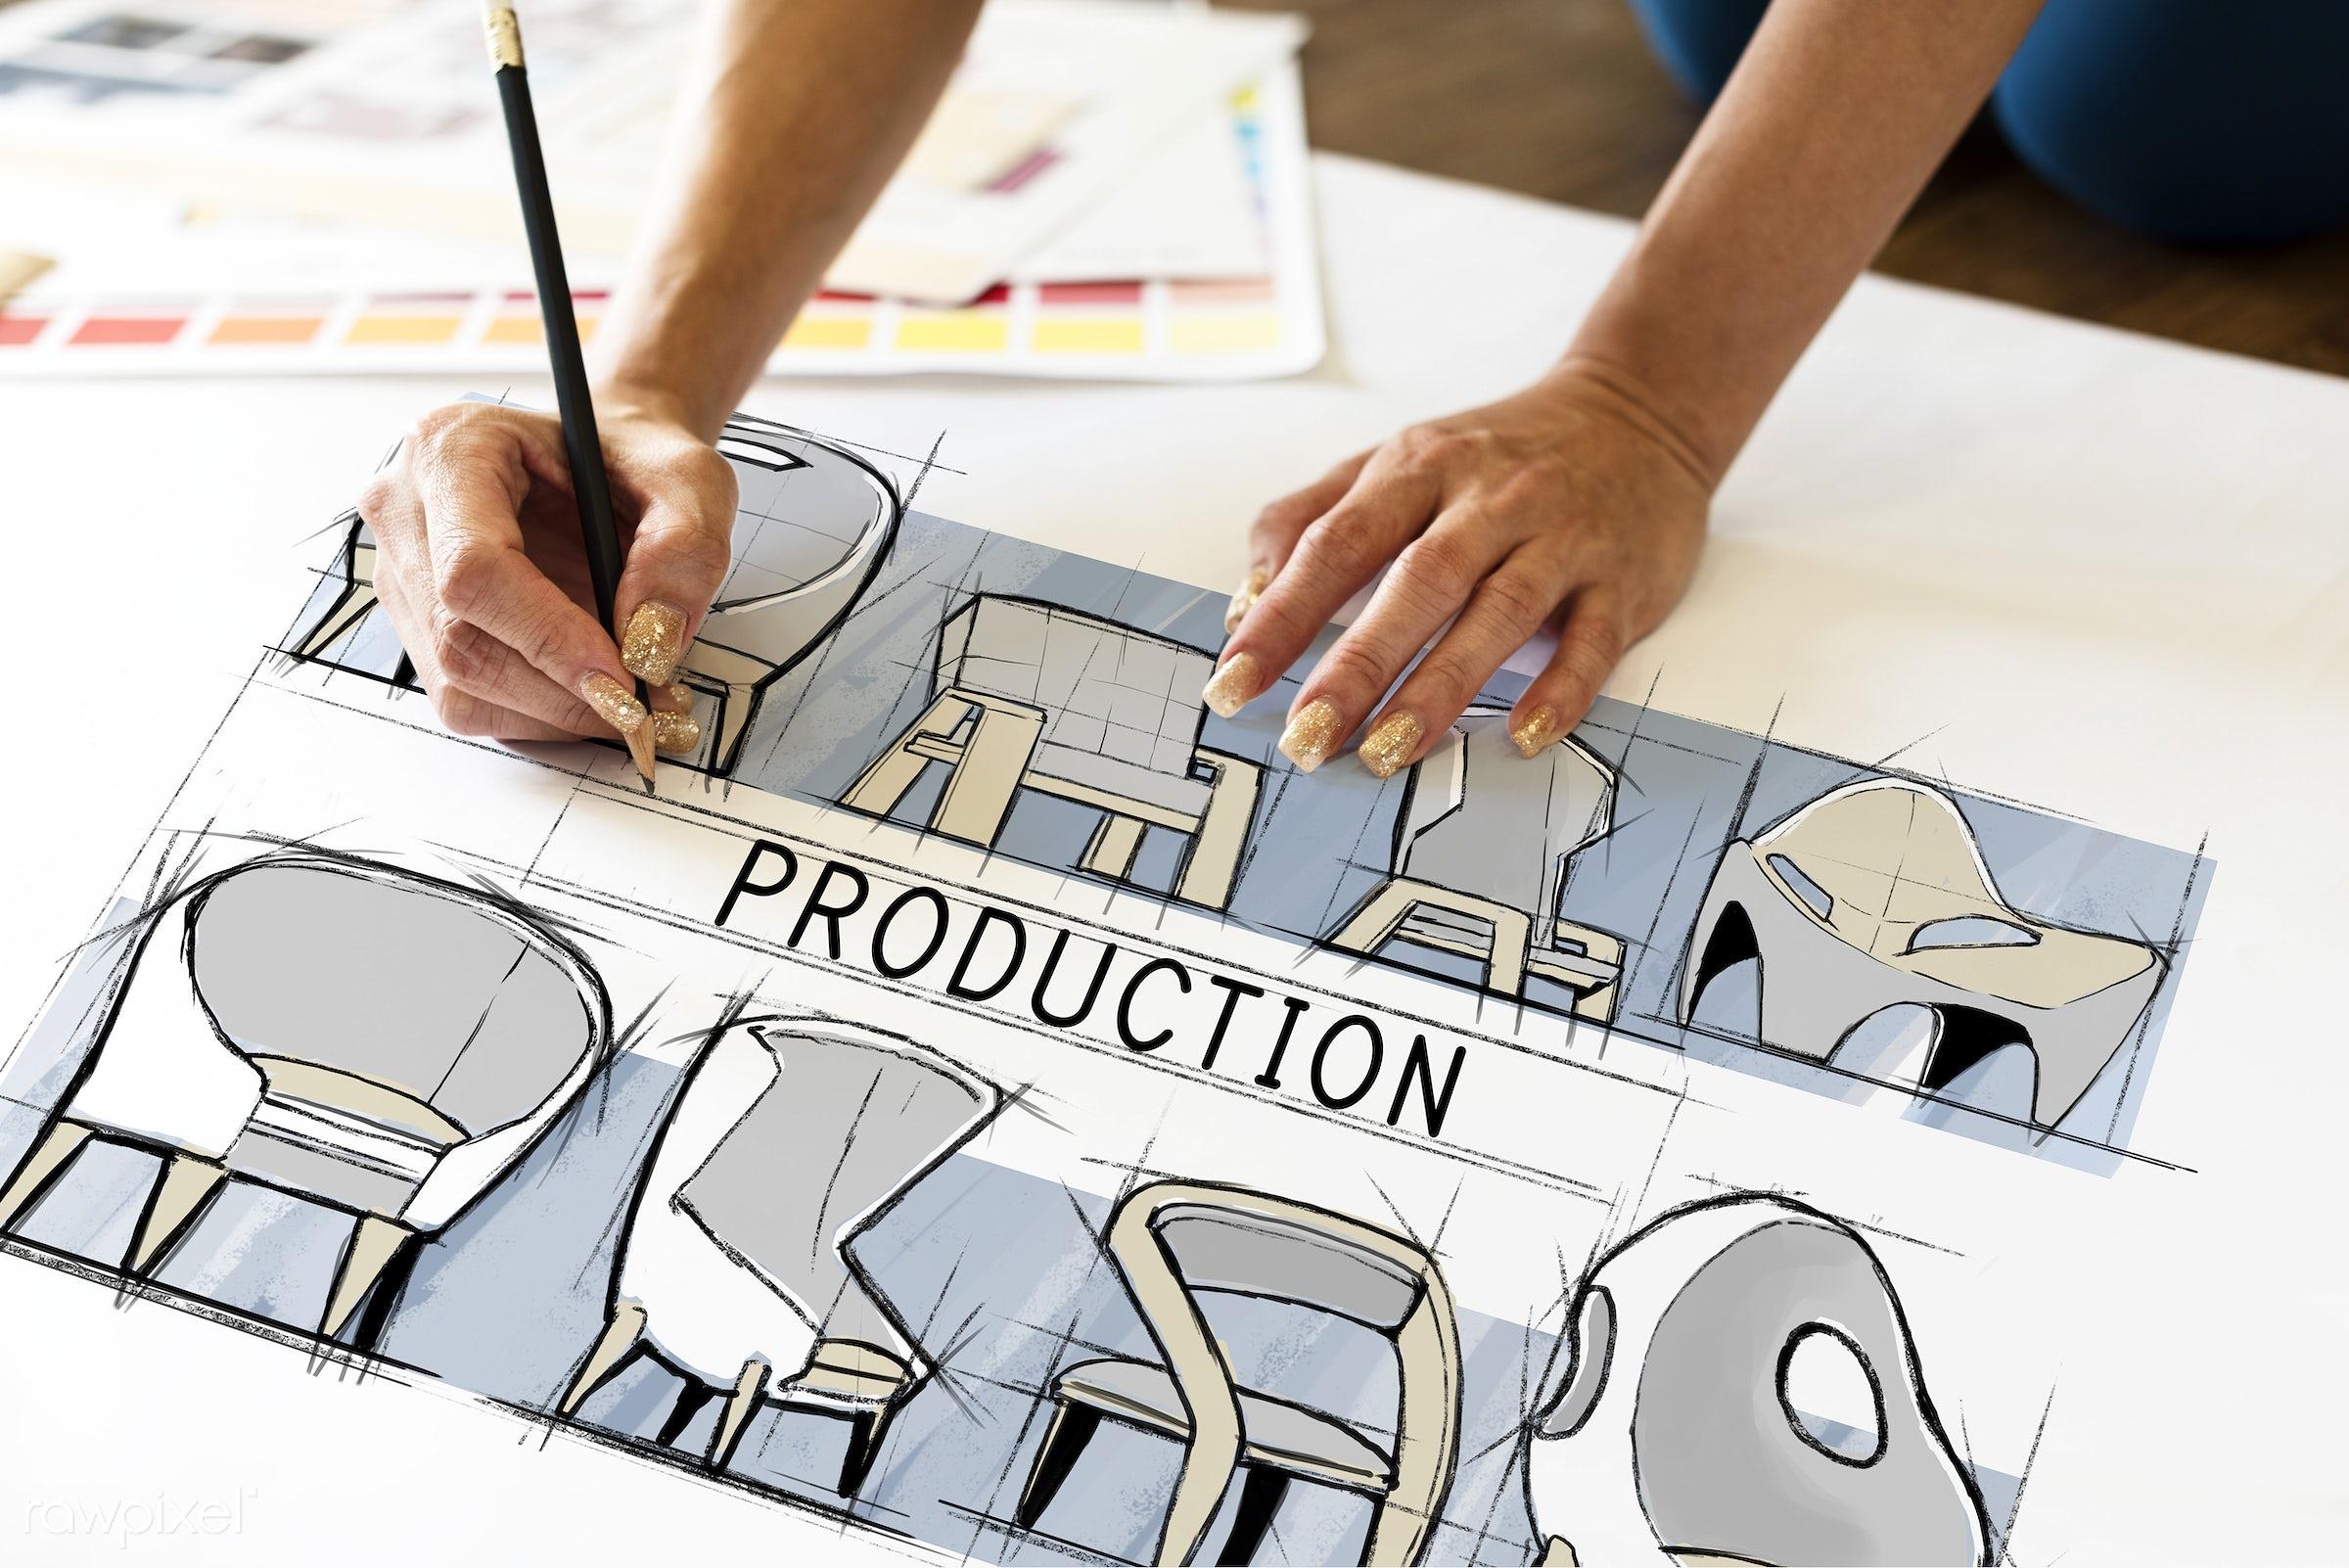 armchair, art, arts, chair, craft, craftsman, craftsmanship, creation, creative, creativity, decoration, design, draft,...